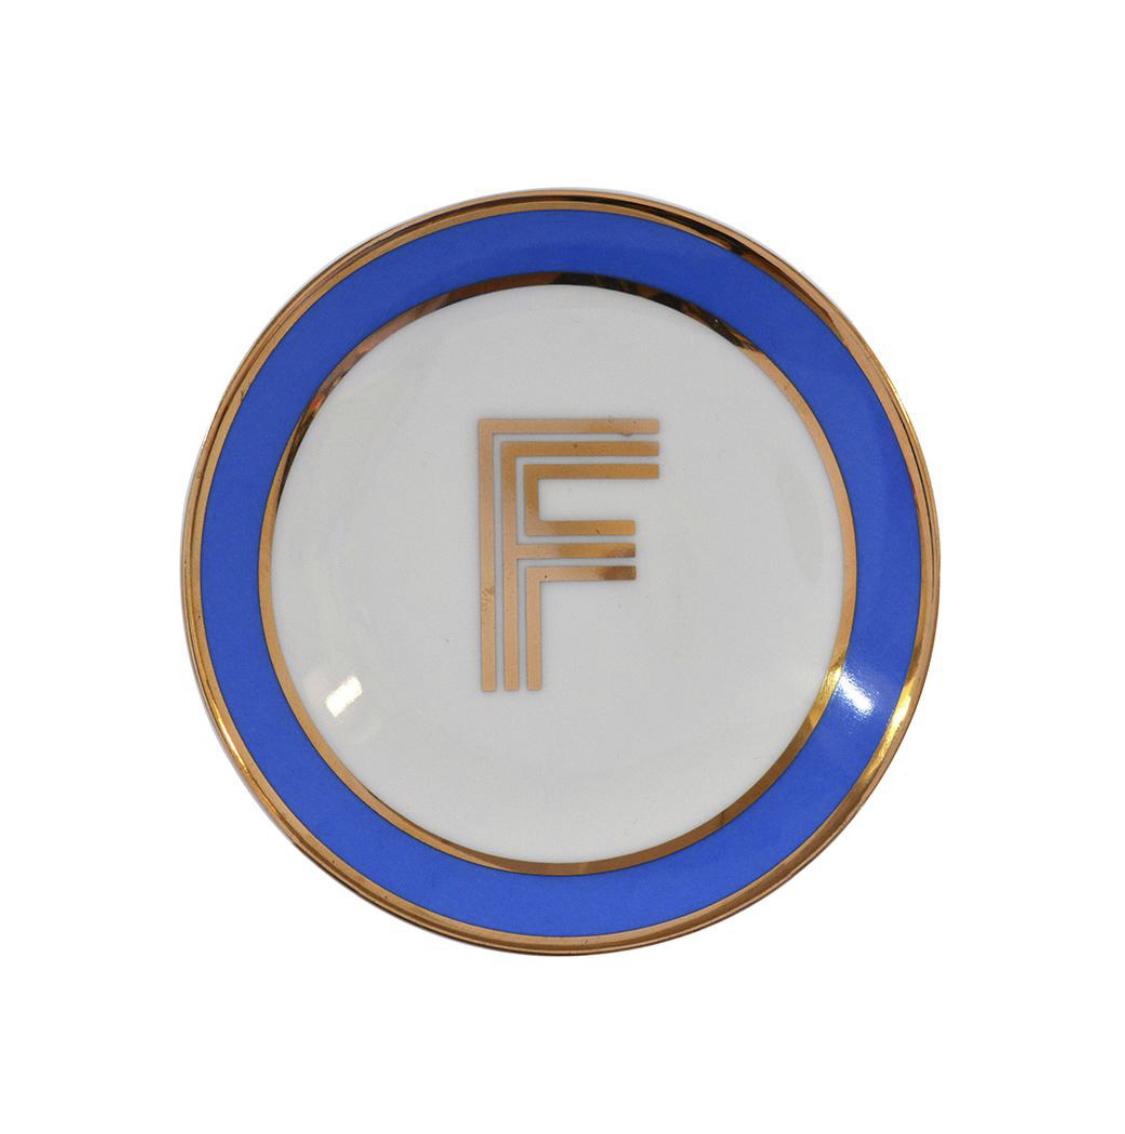 Bombay Duck Alphabet Trinket Dish - F